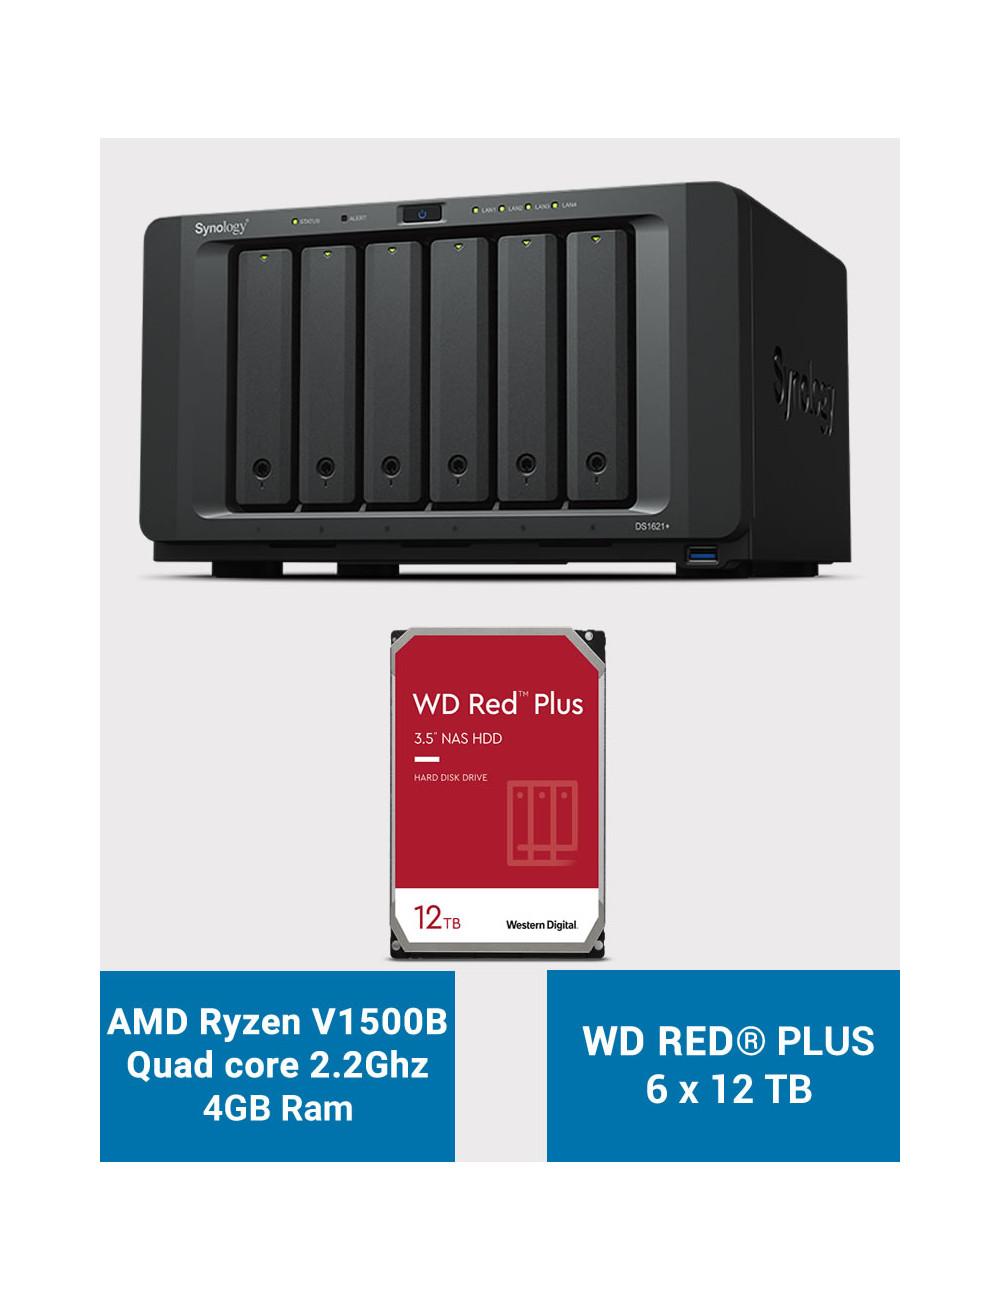 Synology DS218+ NAS Server EXOS ENTERPRISE 8TB (2x4TB)